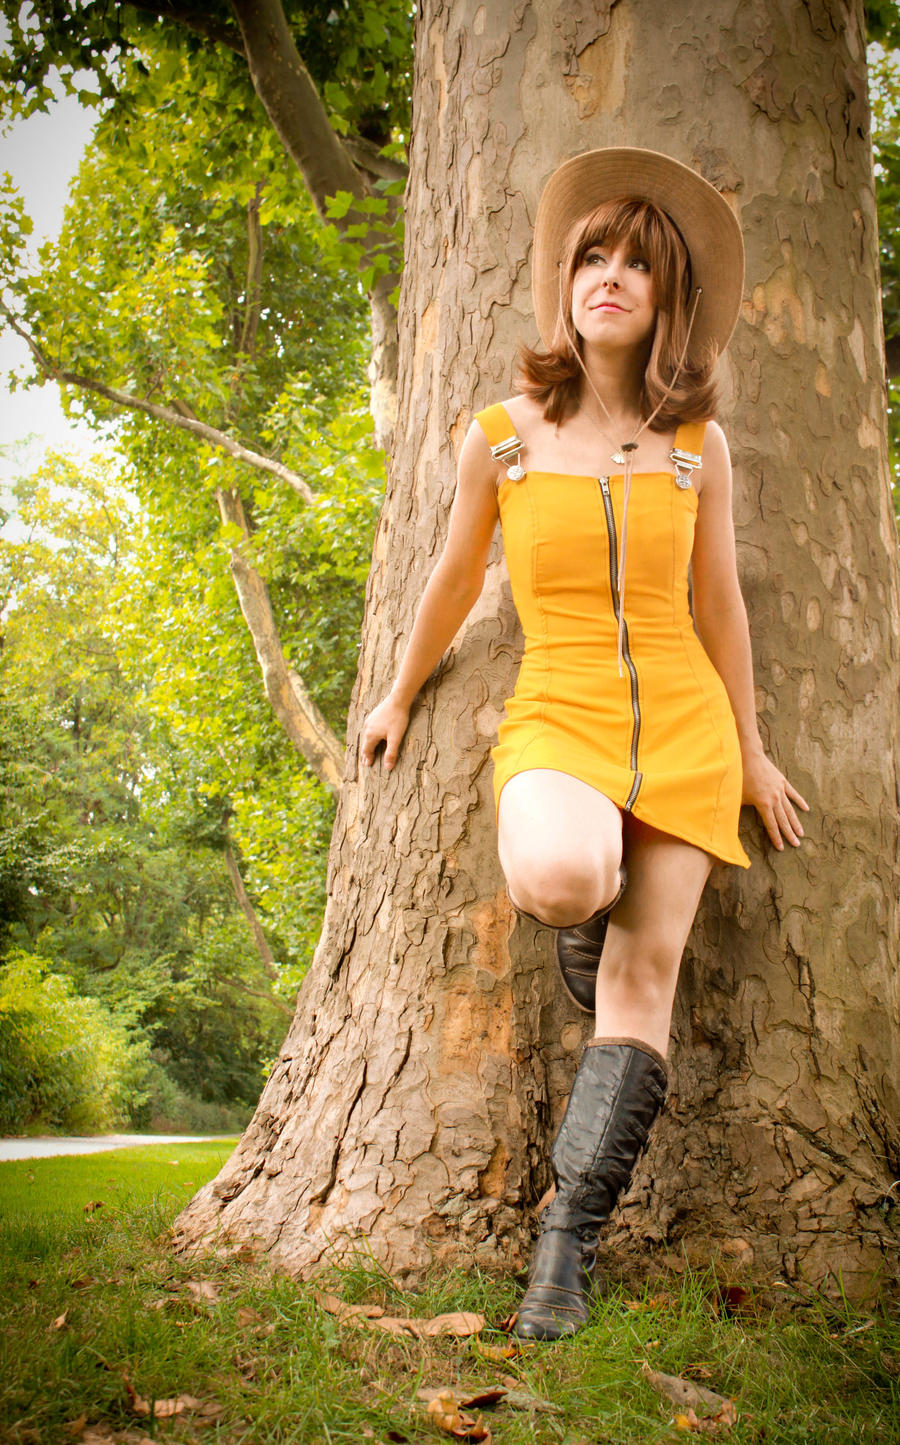 Selphie Tilmitt by Wish-UponAStar